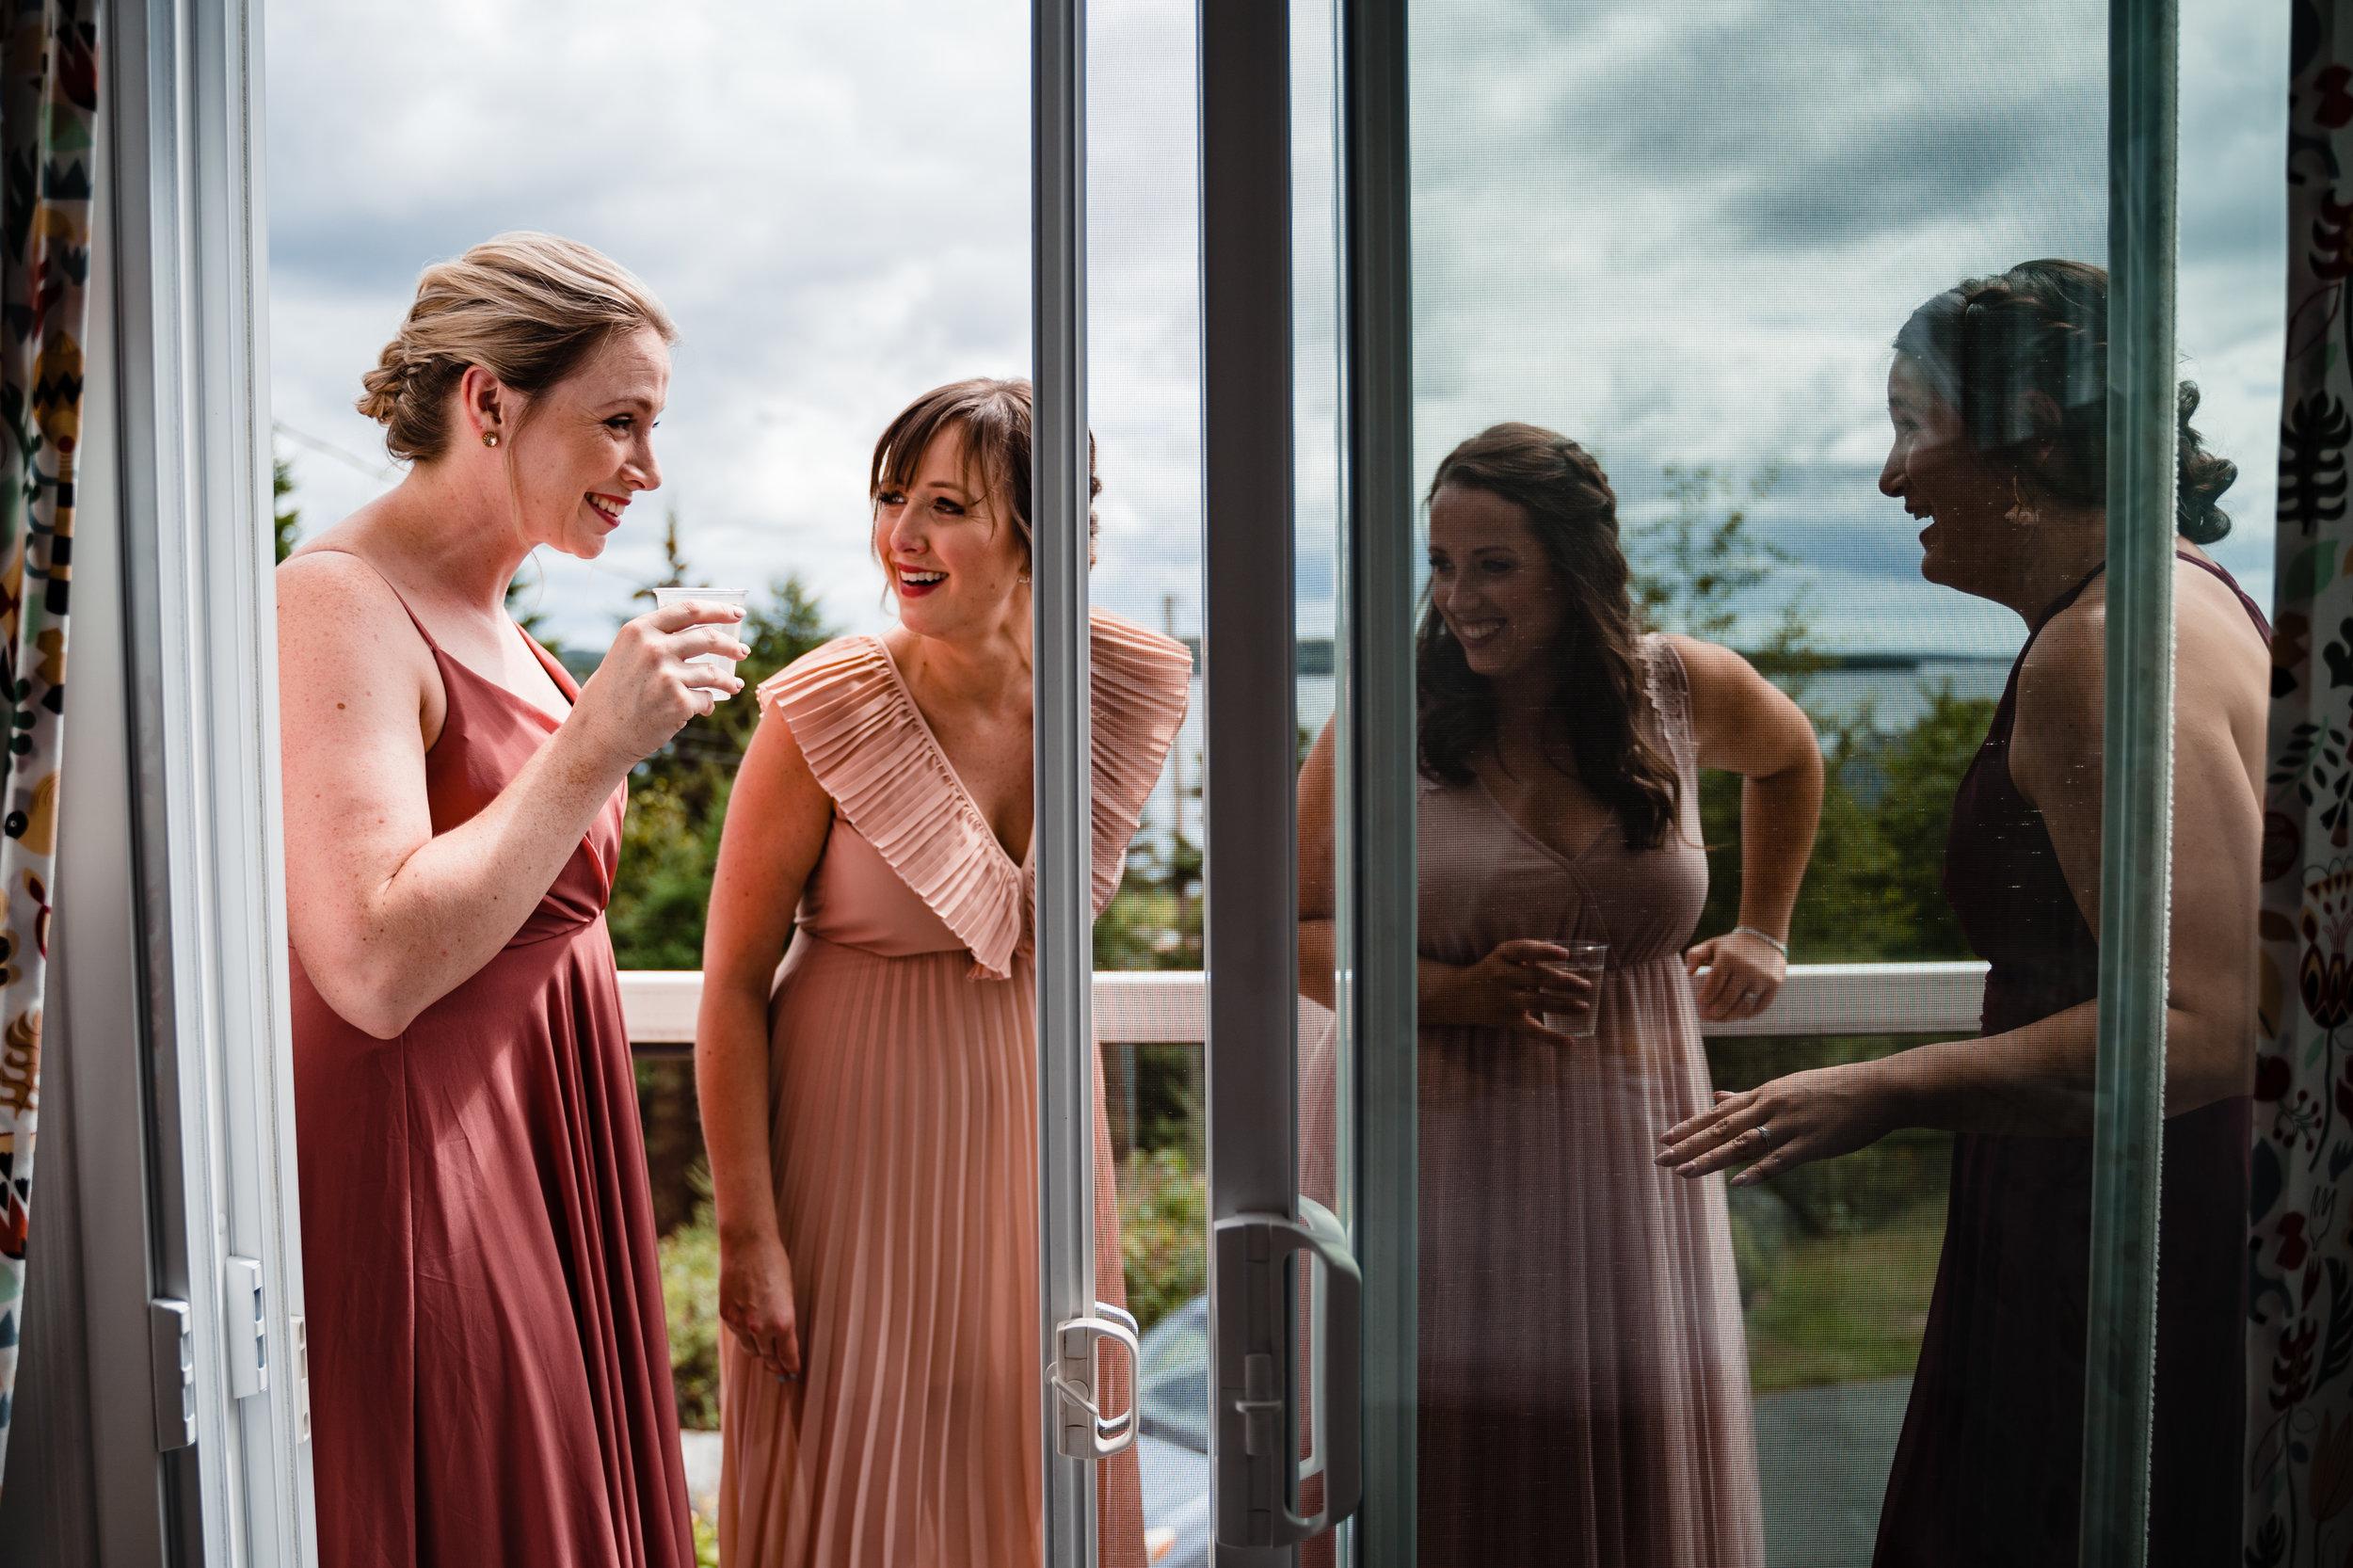 Janelle-Mitch-Halifax-Wedding-Nova-Scotia-Photography (16 of 163).jpg